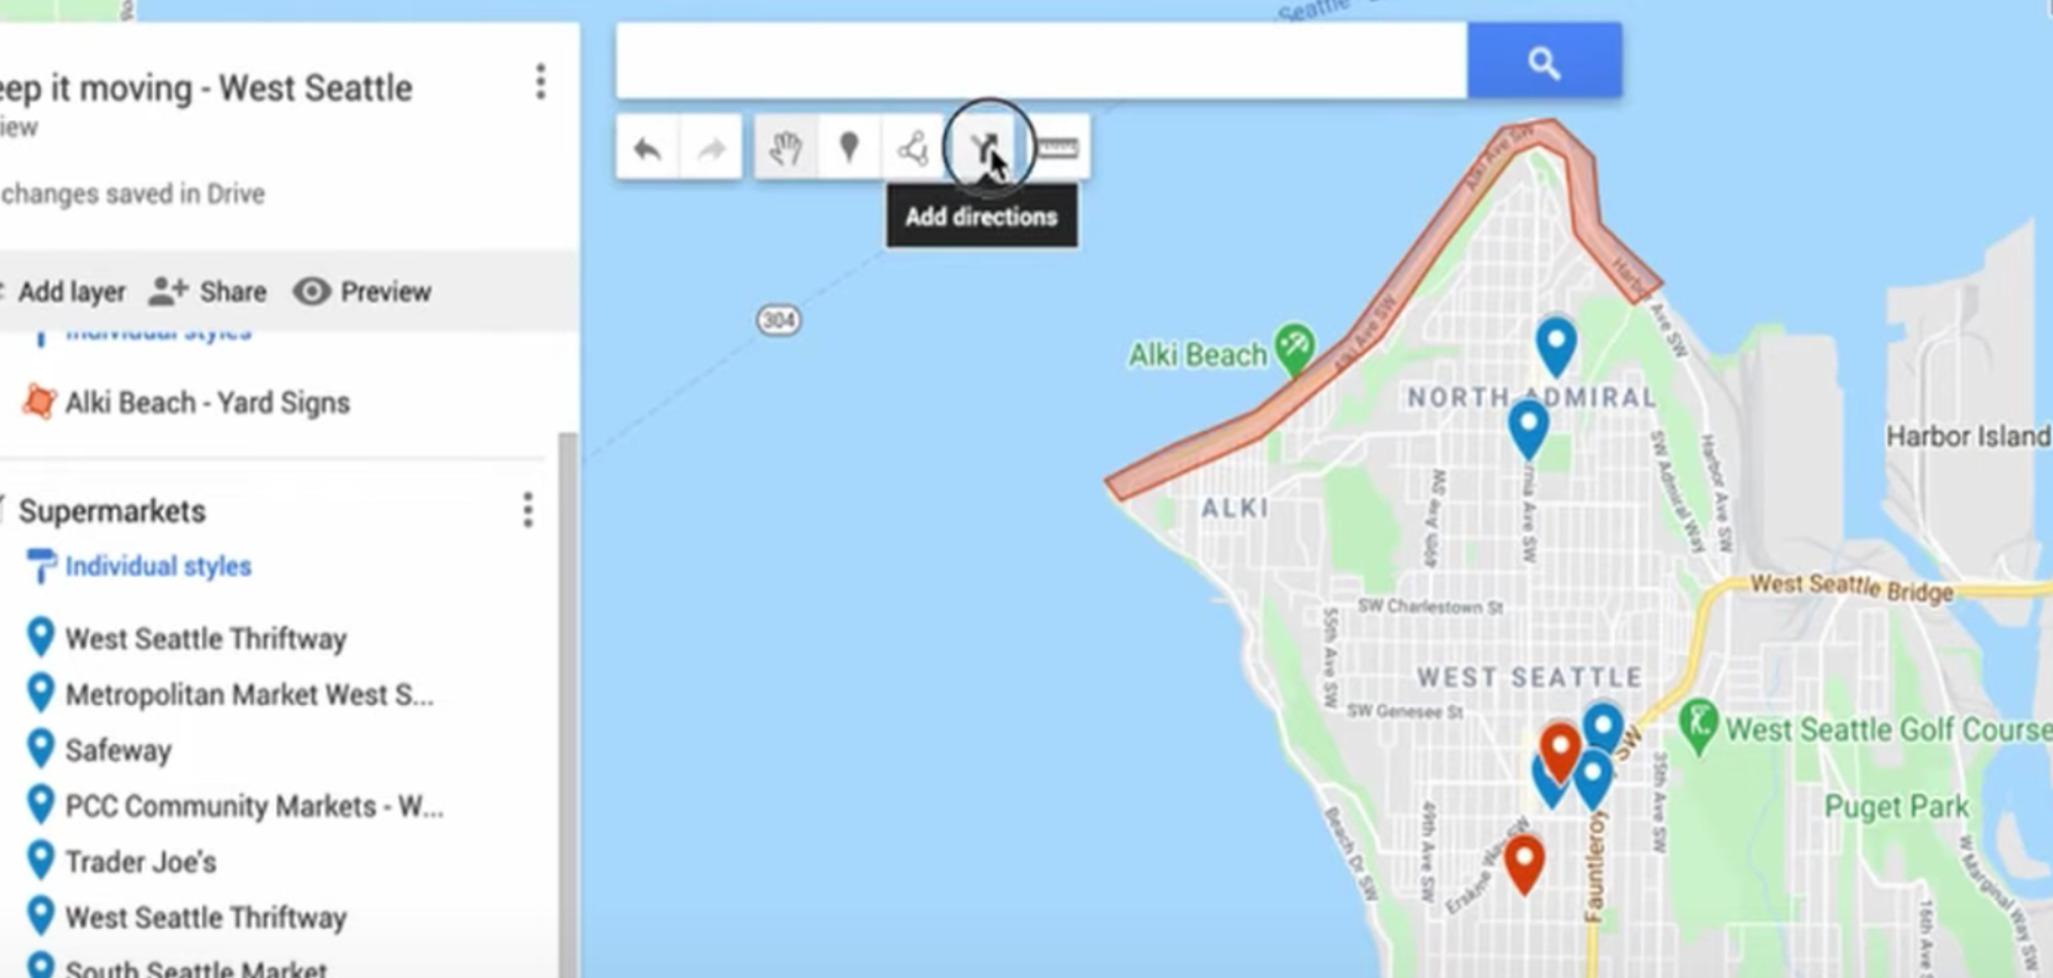 Add directions visualization